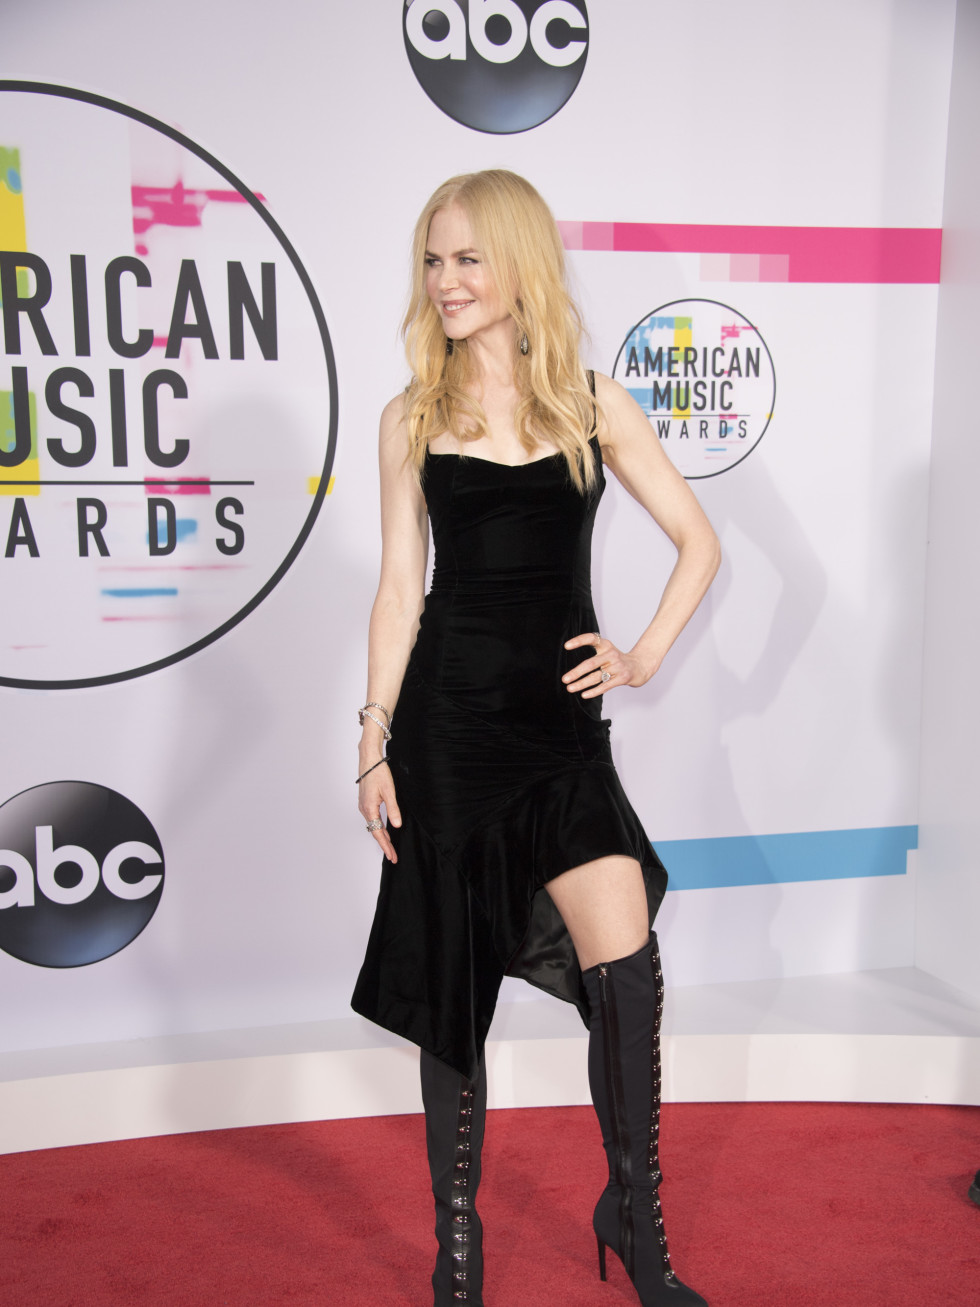 American Music Awards Nicole Kidman